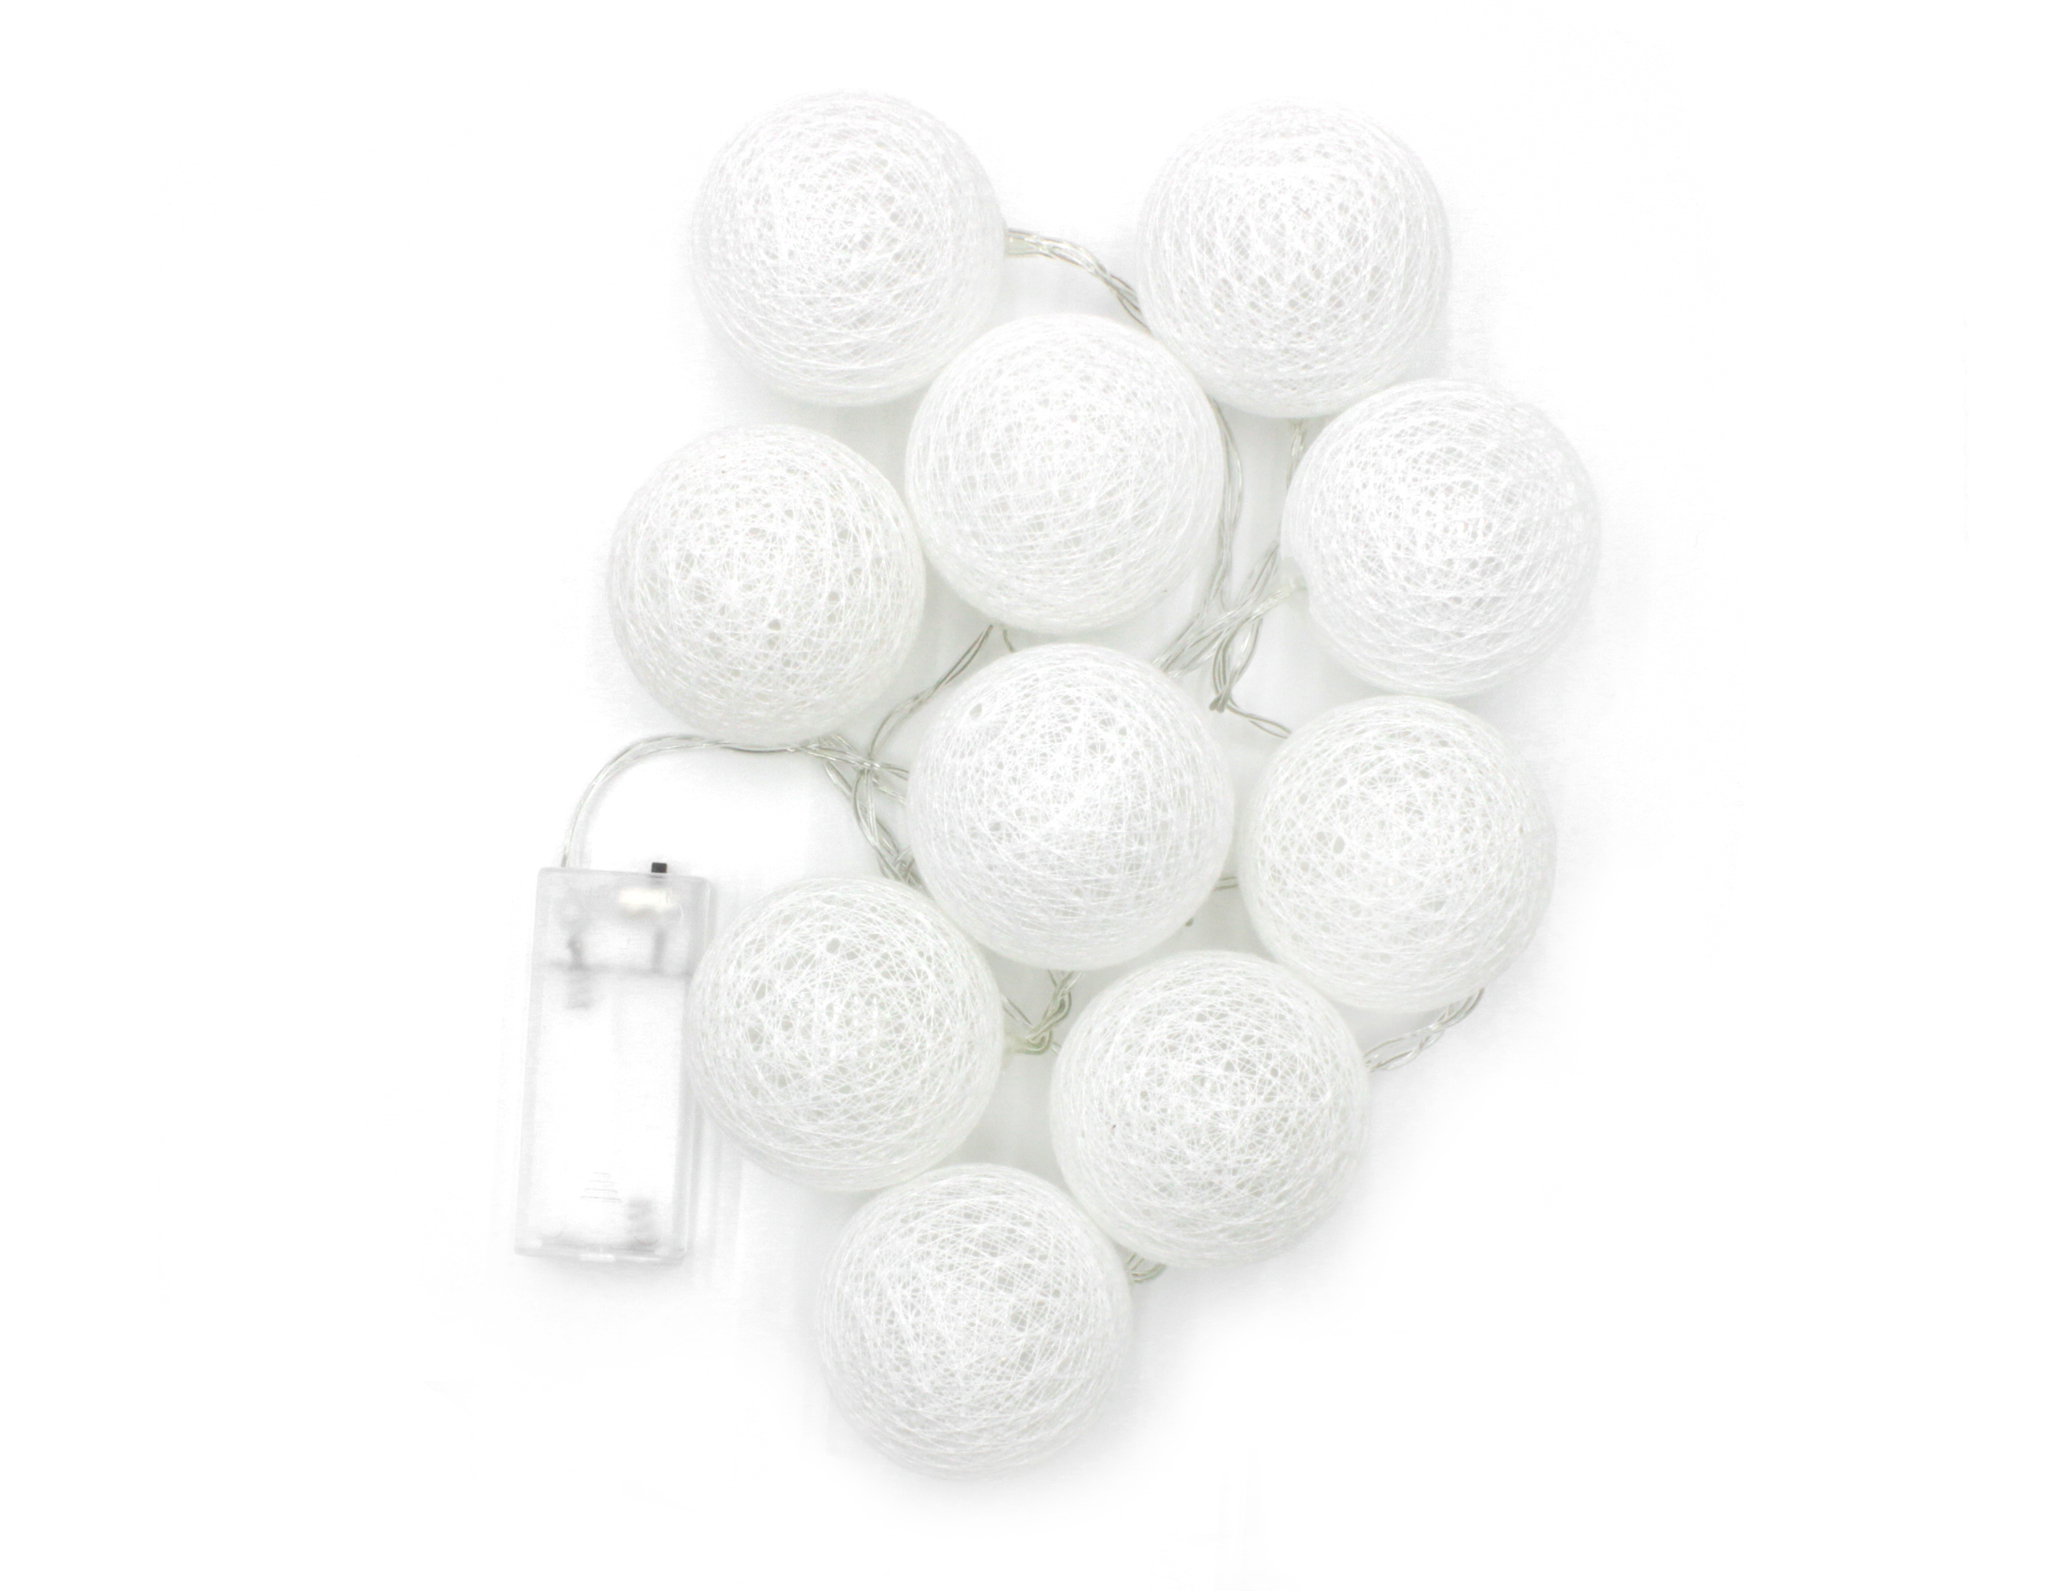 Гирлянда-шары,10 шт (батарейки)